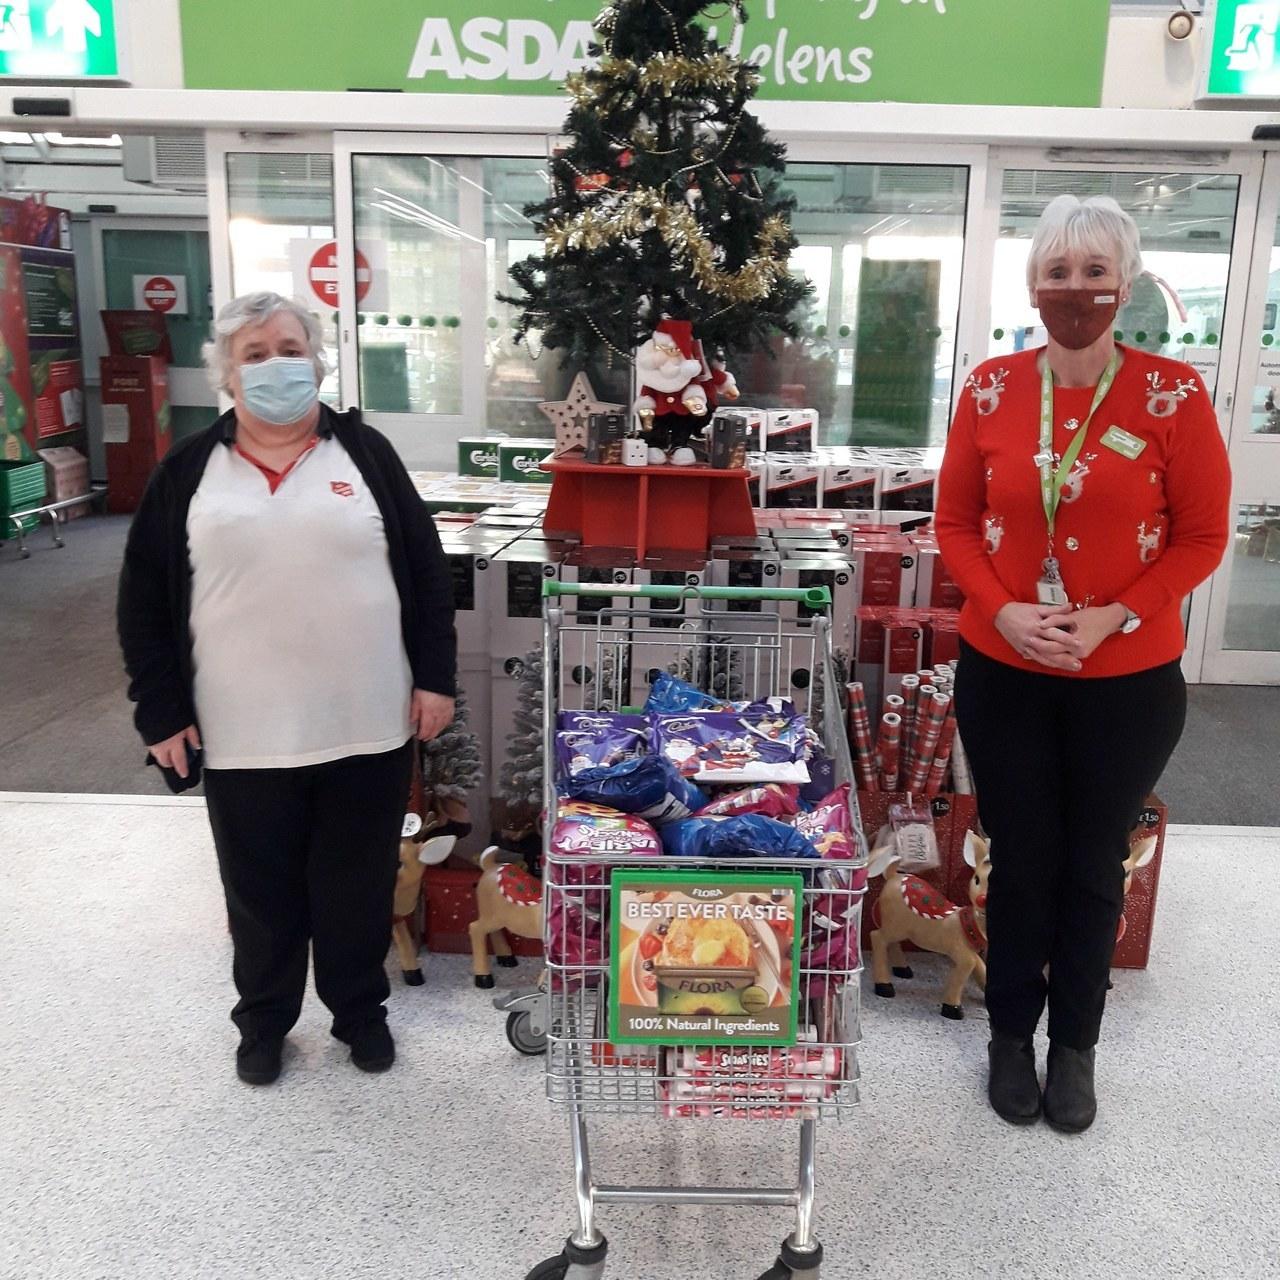 Salvation Army donation. | Asda St Helens